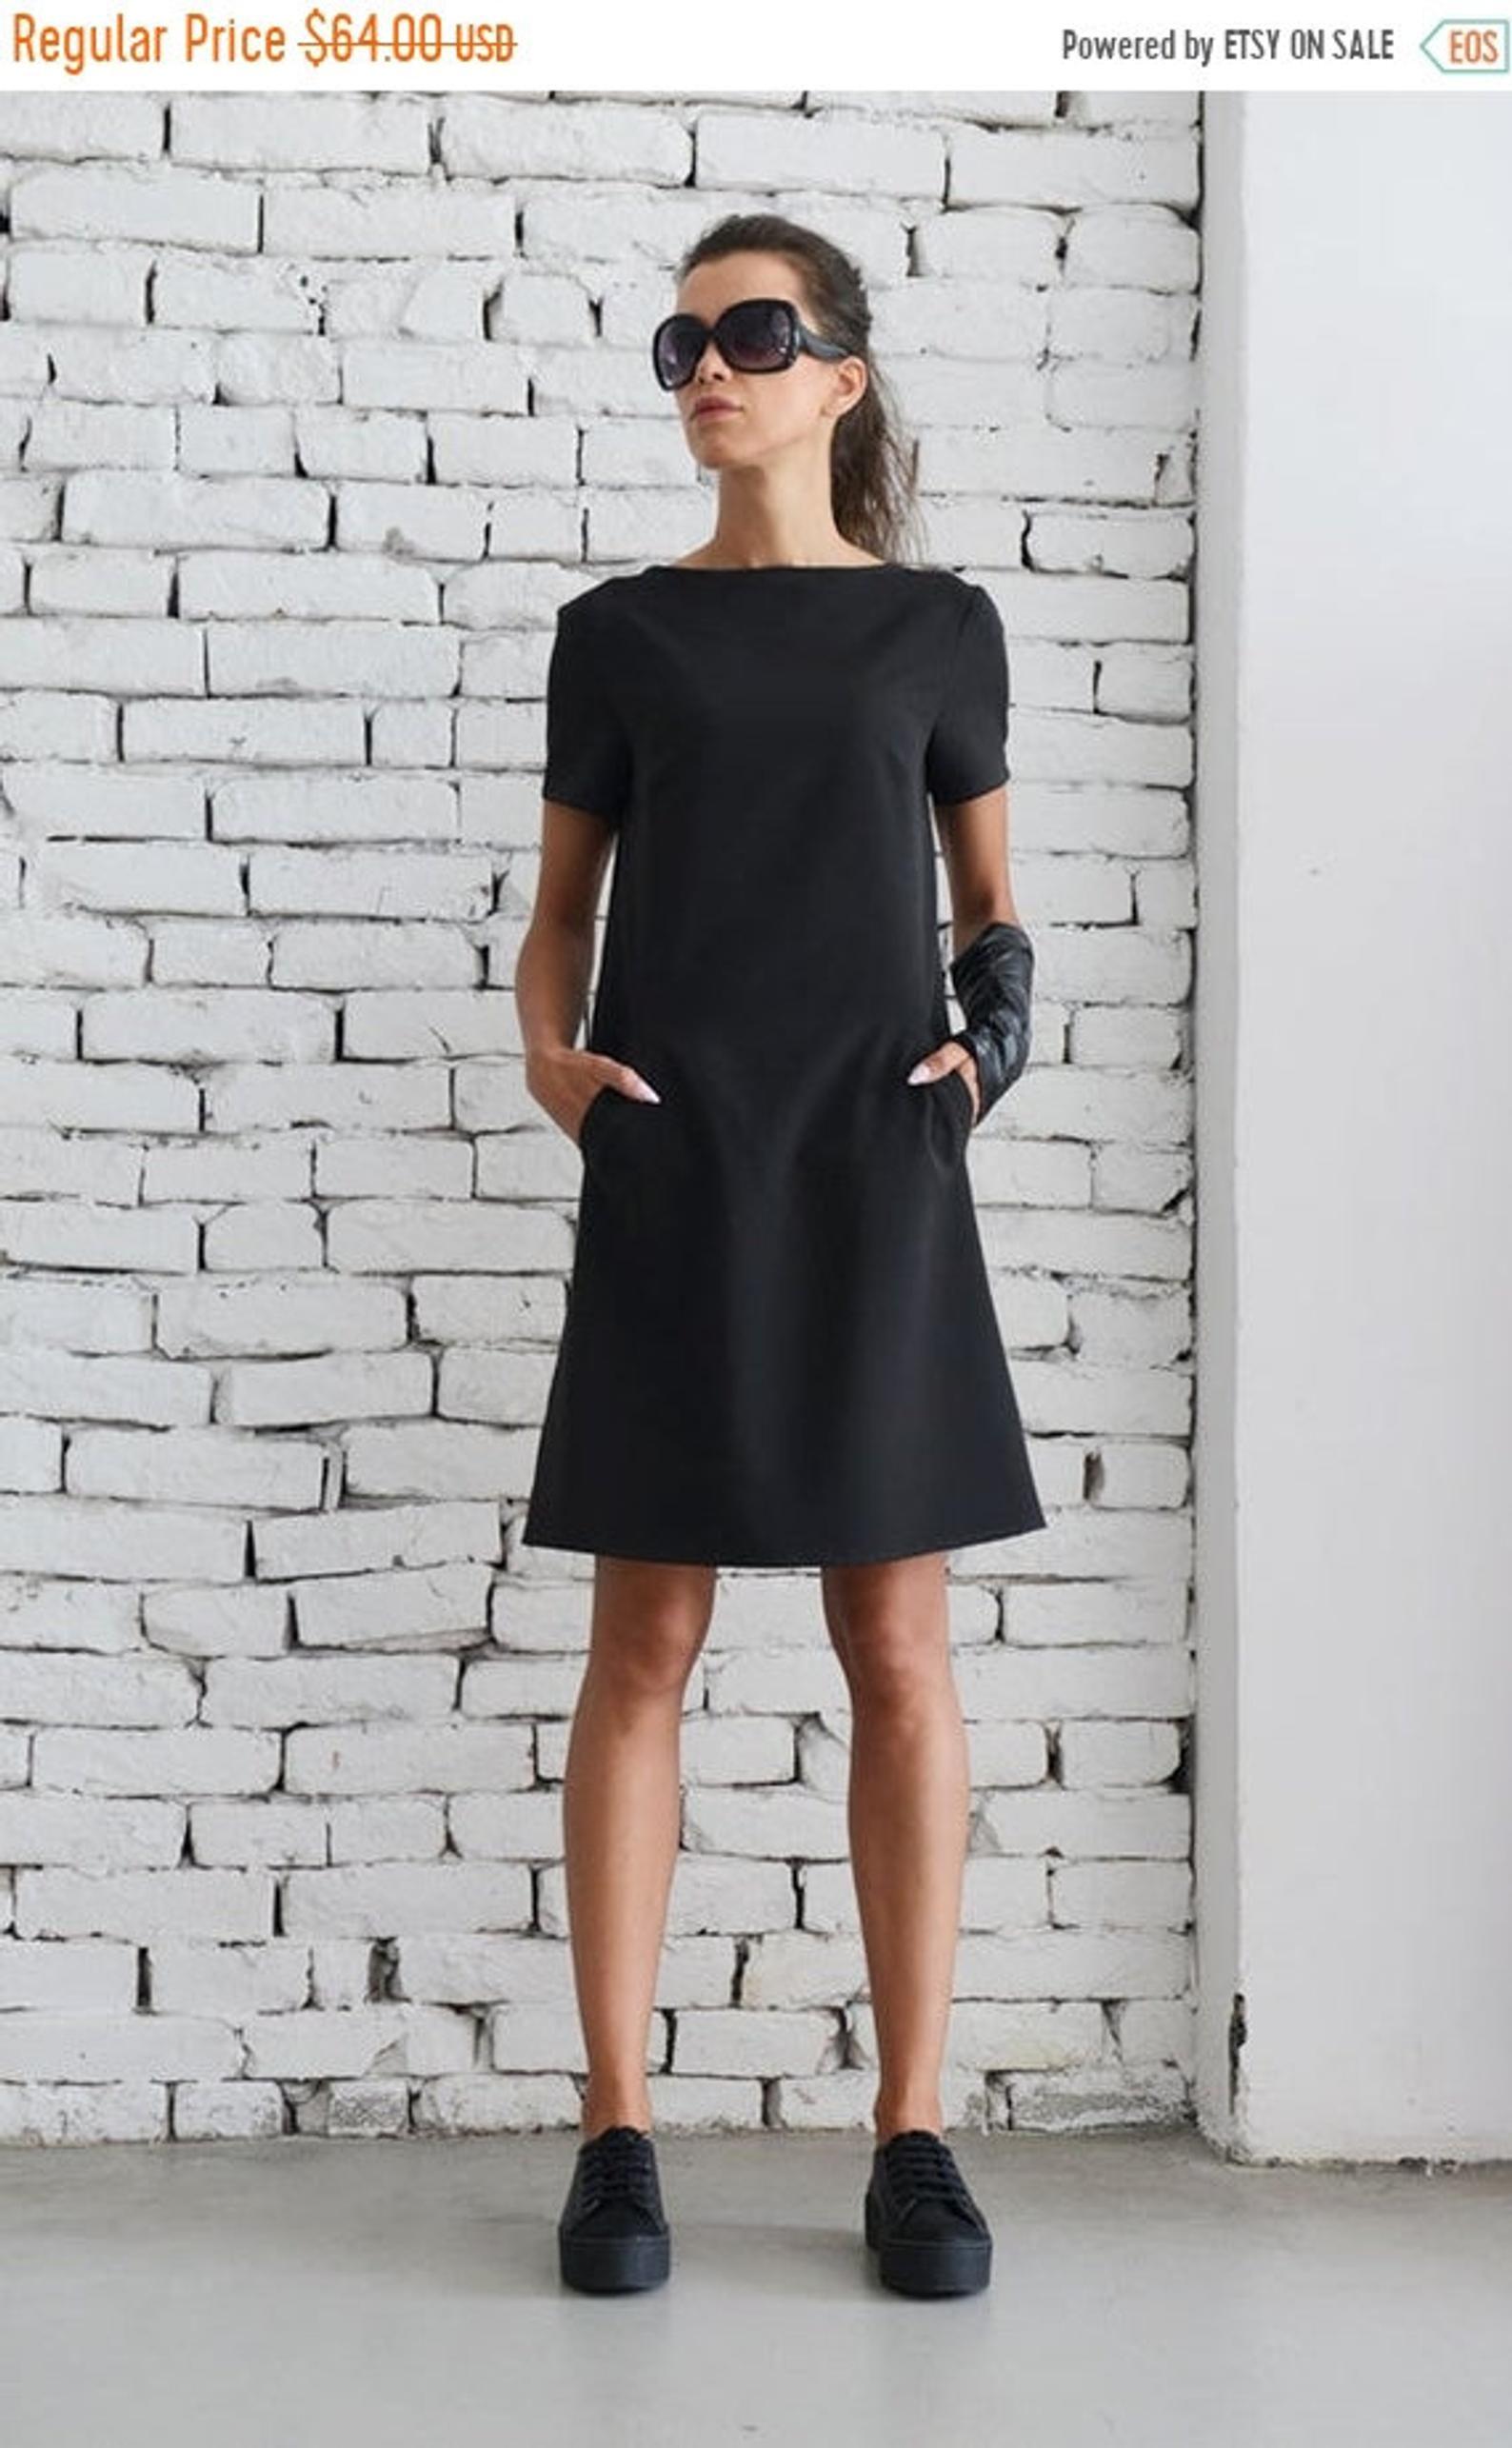 Black Casual Dress Little Black Dress Midi Office Dress Short Etsy Black Dresses Casual Little Black Dress Black Short Dress [ 2571 x 1588 Pixel ]